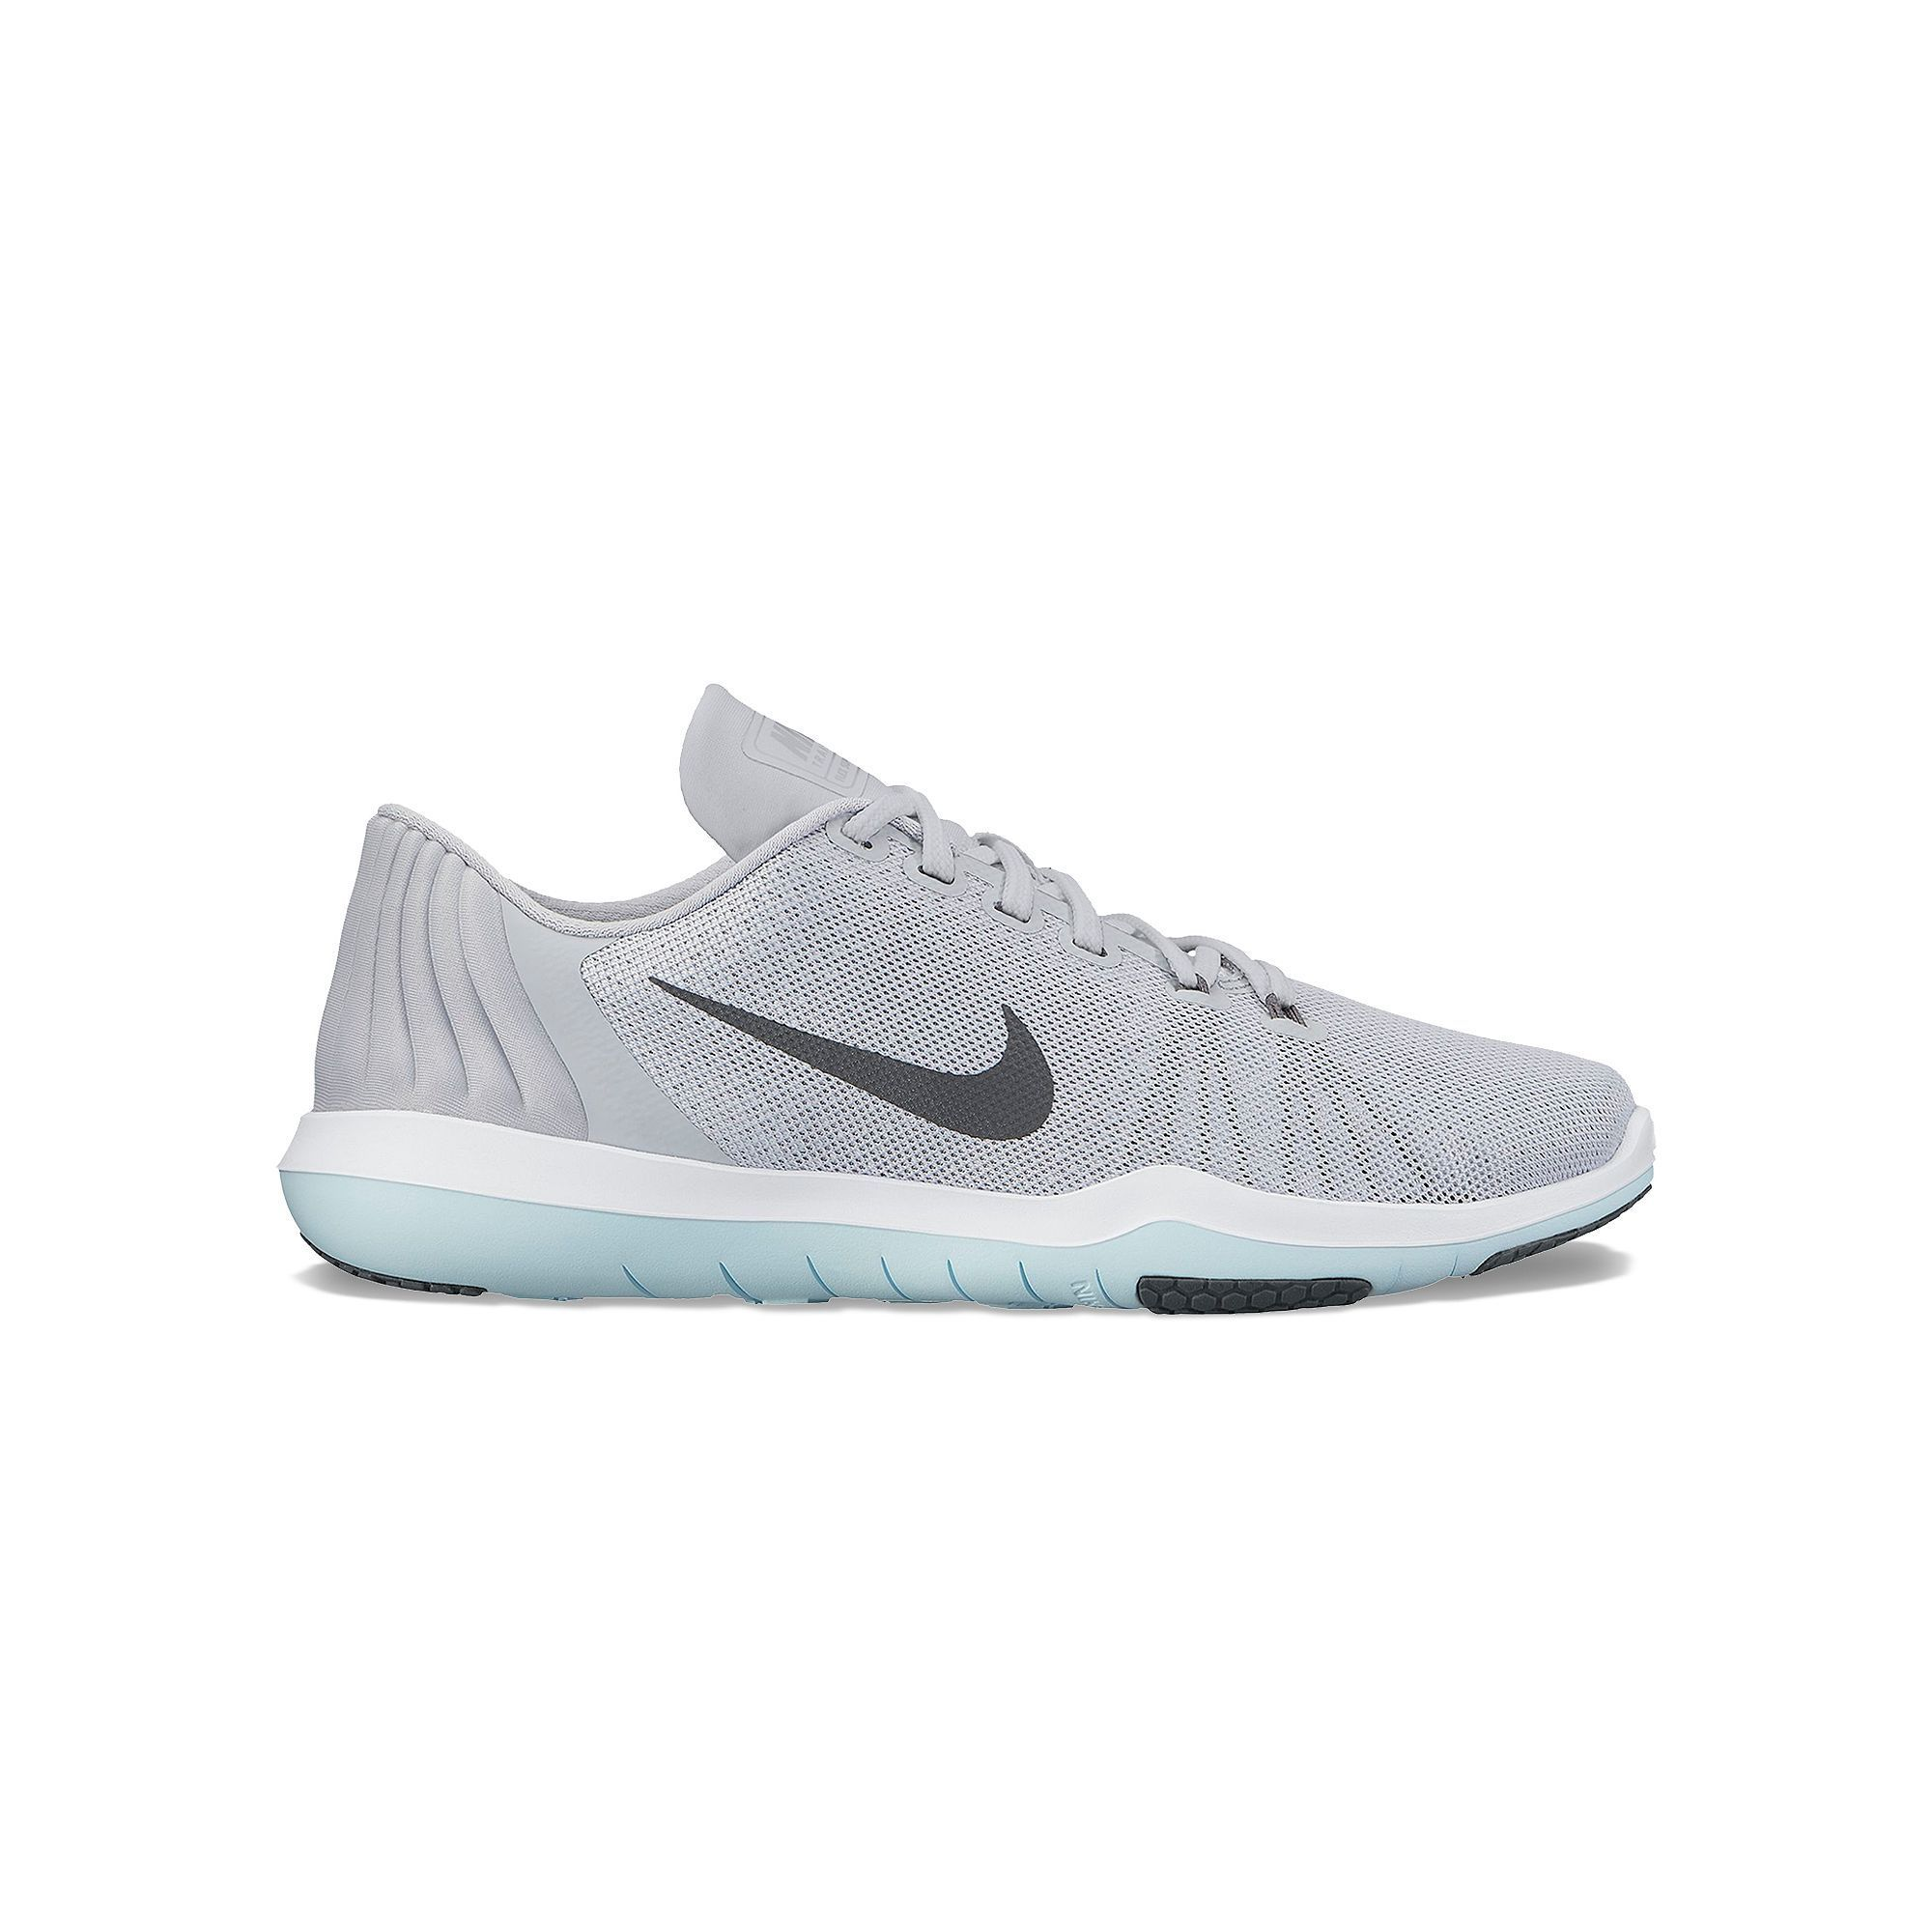 a25c9f8dd0cac Nike Flex Supreme TR 5 Women s Cross-Training Shoes